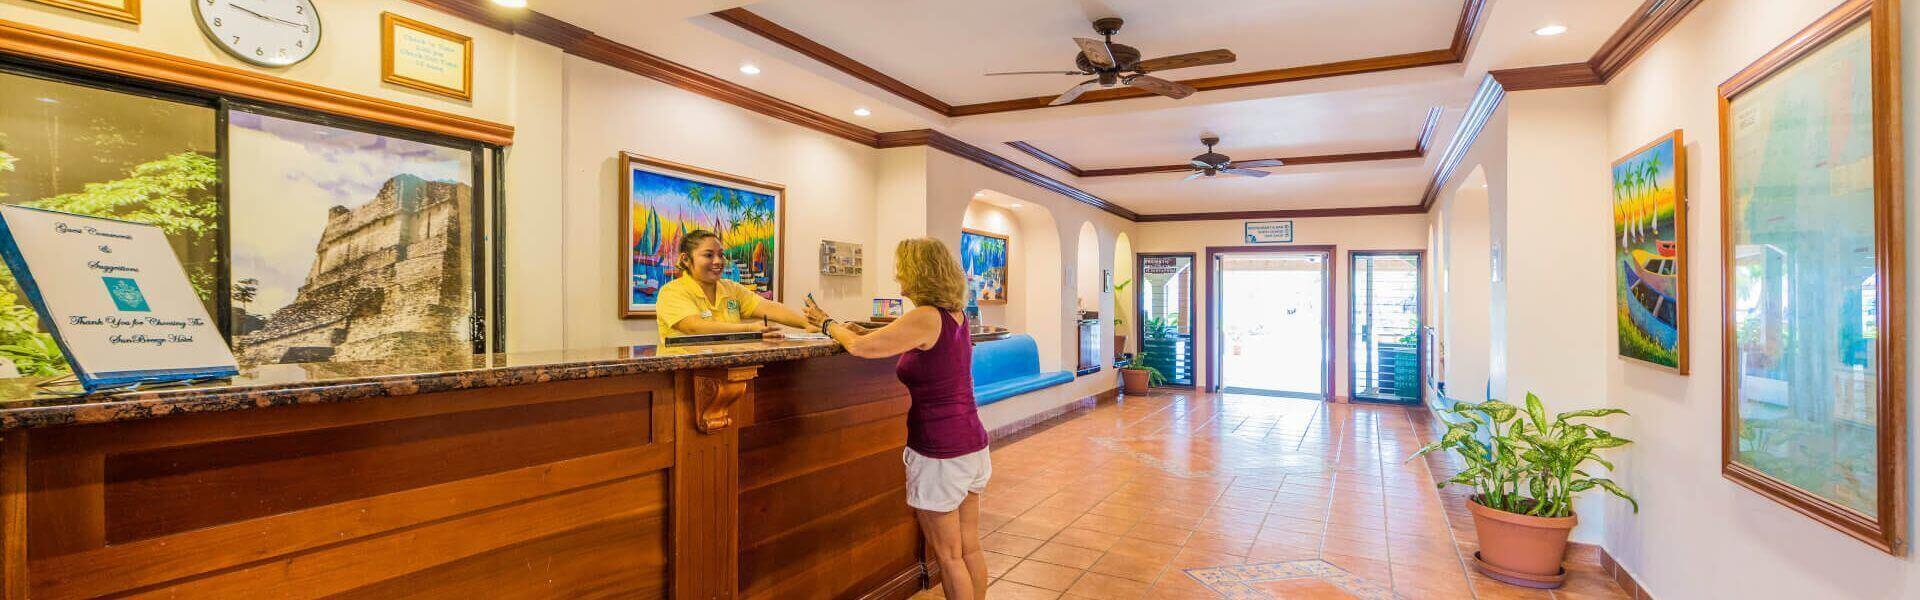 Sunbreeze hotel lobby